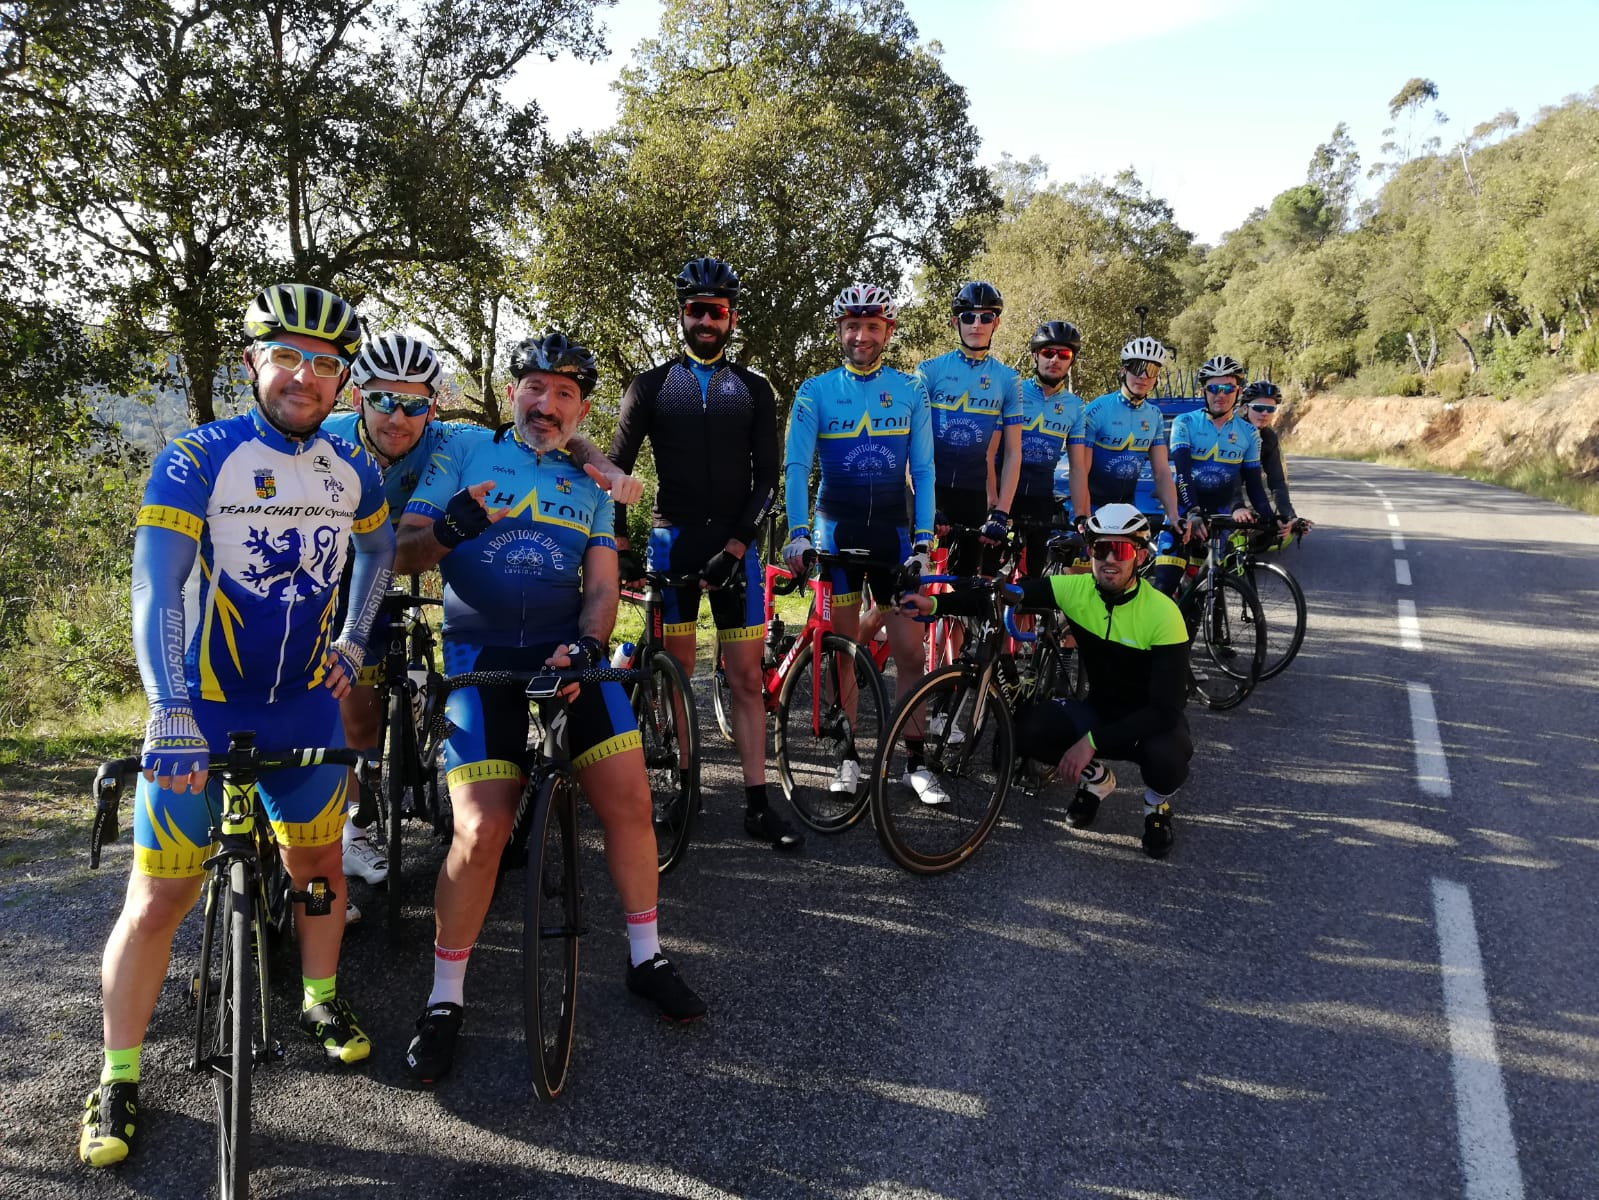 https://teamchatoucyclisme.com/wp-content/uploads/2020/11/86471904_962554320808020_8258970798786609152_o.jpg